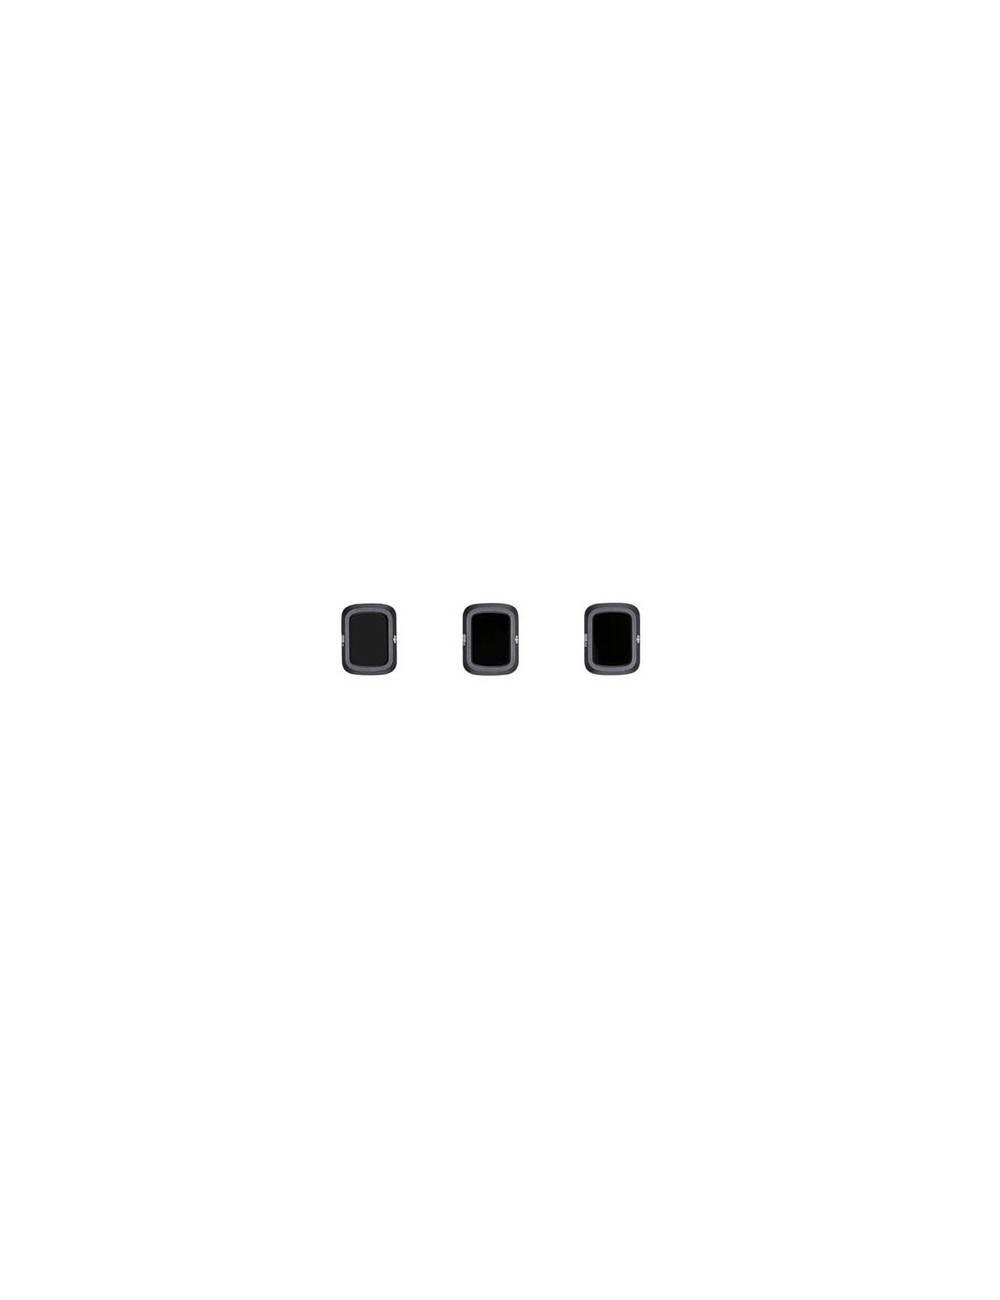 DJI CrystalSky 7.85 Pollici Ultra Luminosità